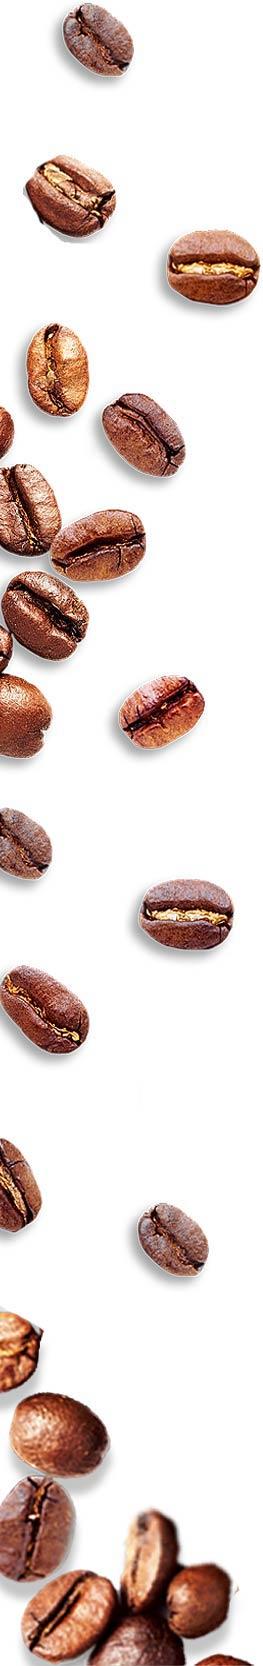 Grains café gauche